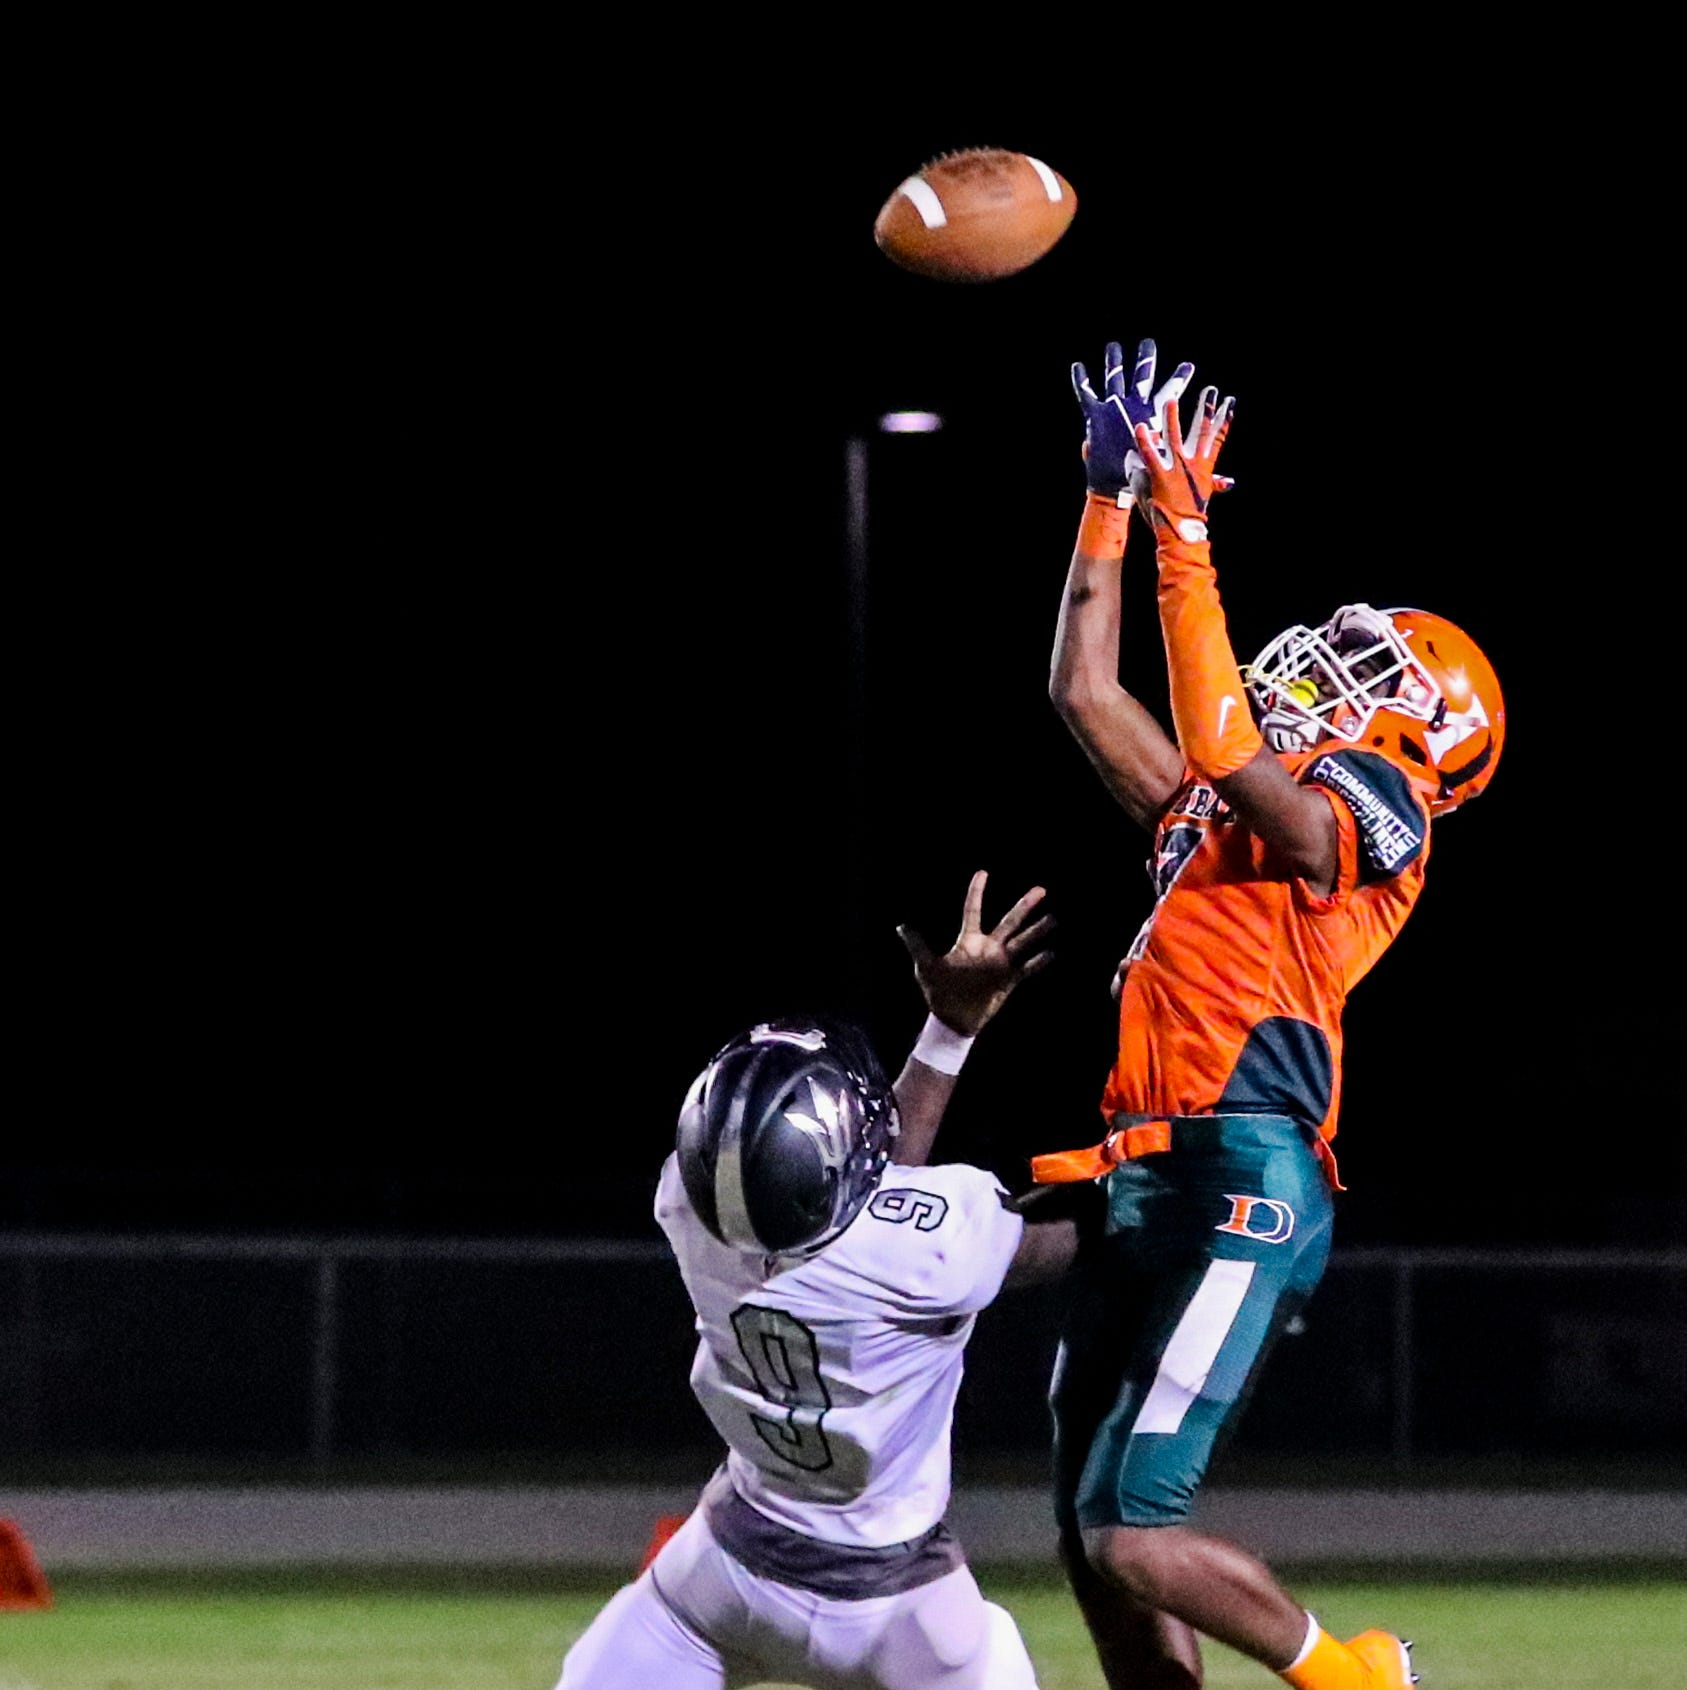 High School Football roundup: Lehigh loses in OT, North, Dunbar, ECS roll